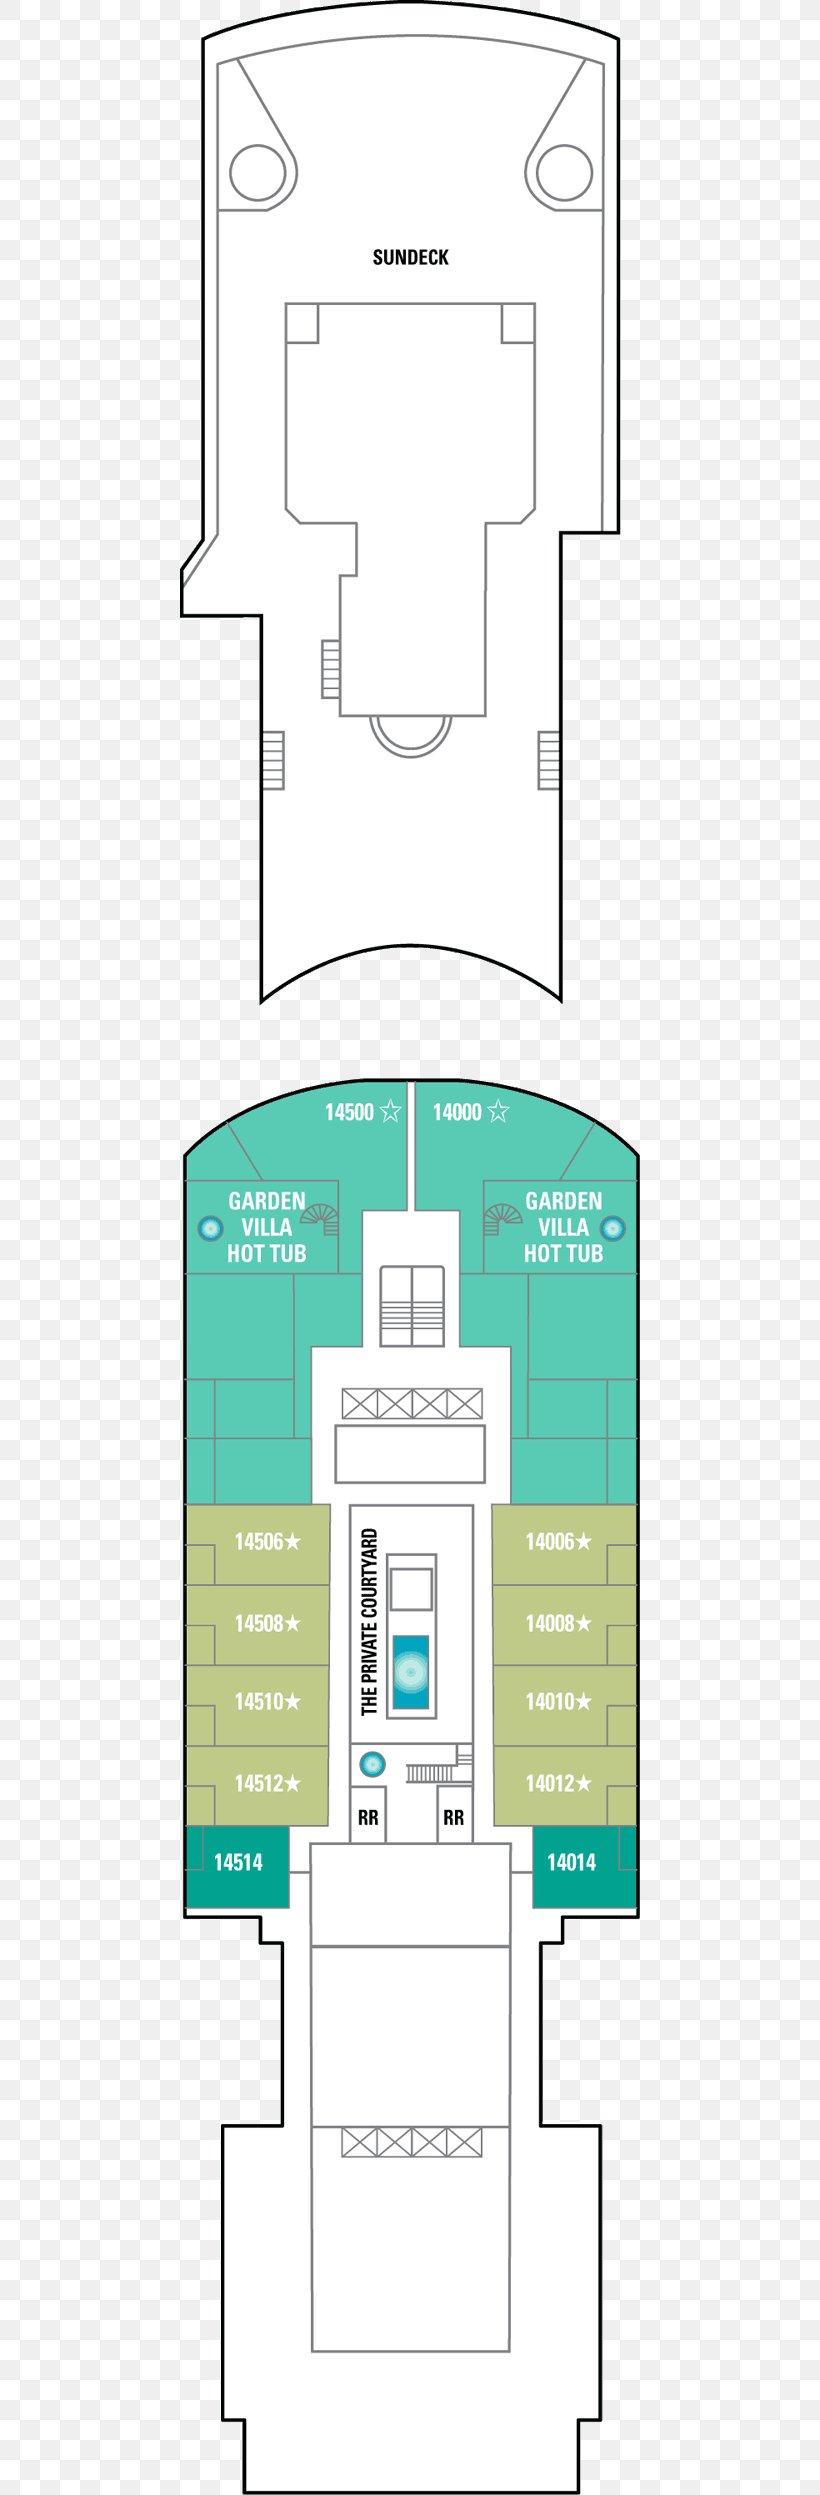 Norwegian Jewel Cruise Ship Norwegian Cruise Line Deck Png